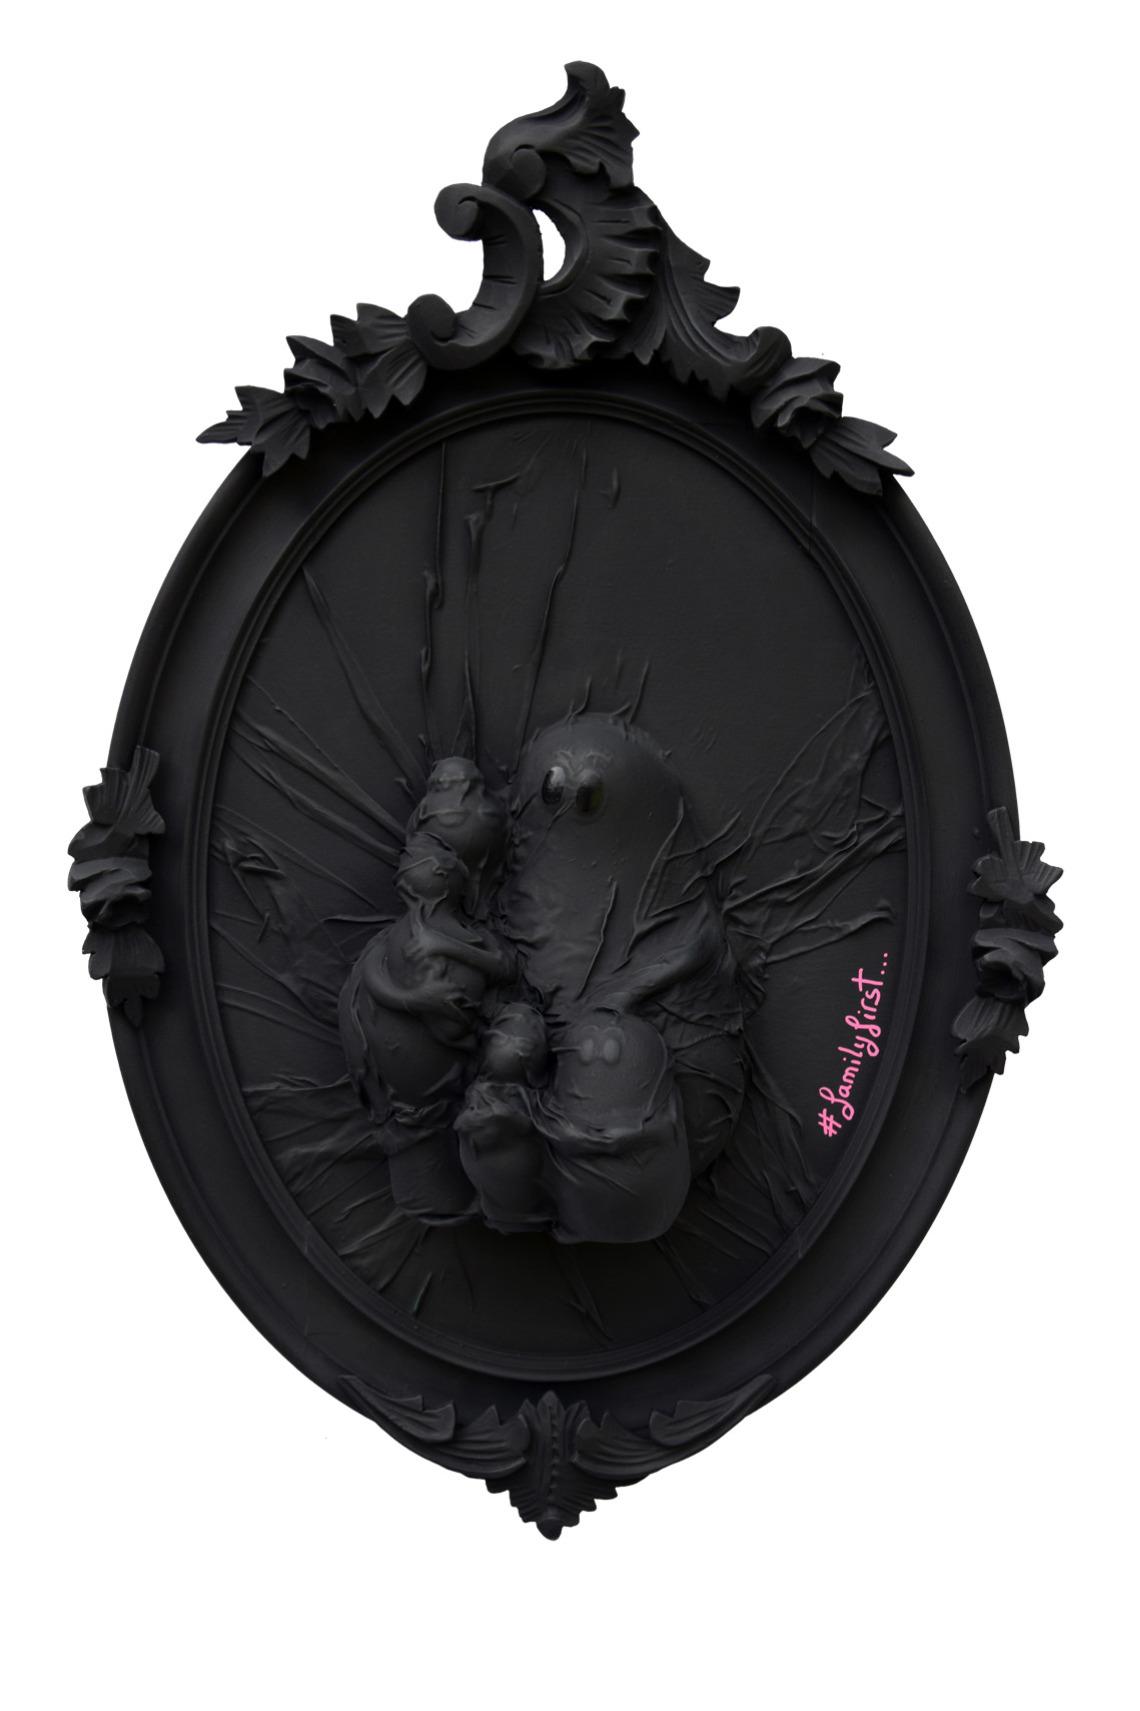 barbapapa dysney comics tableau oeuvre black monochrome hastag instagram #